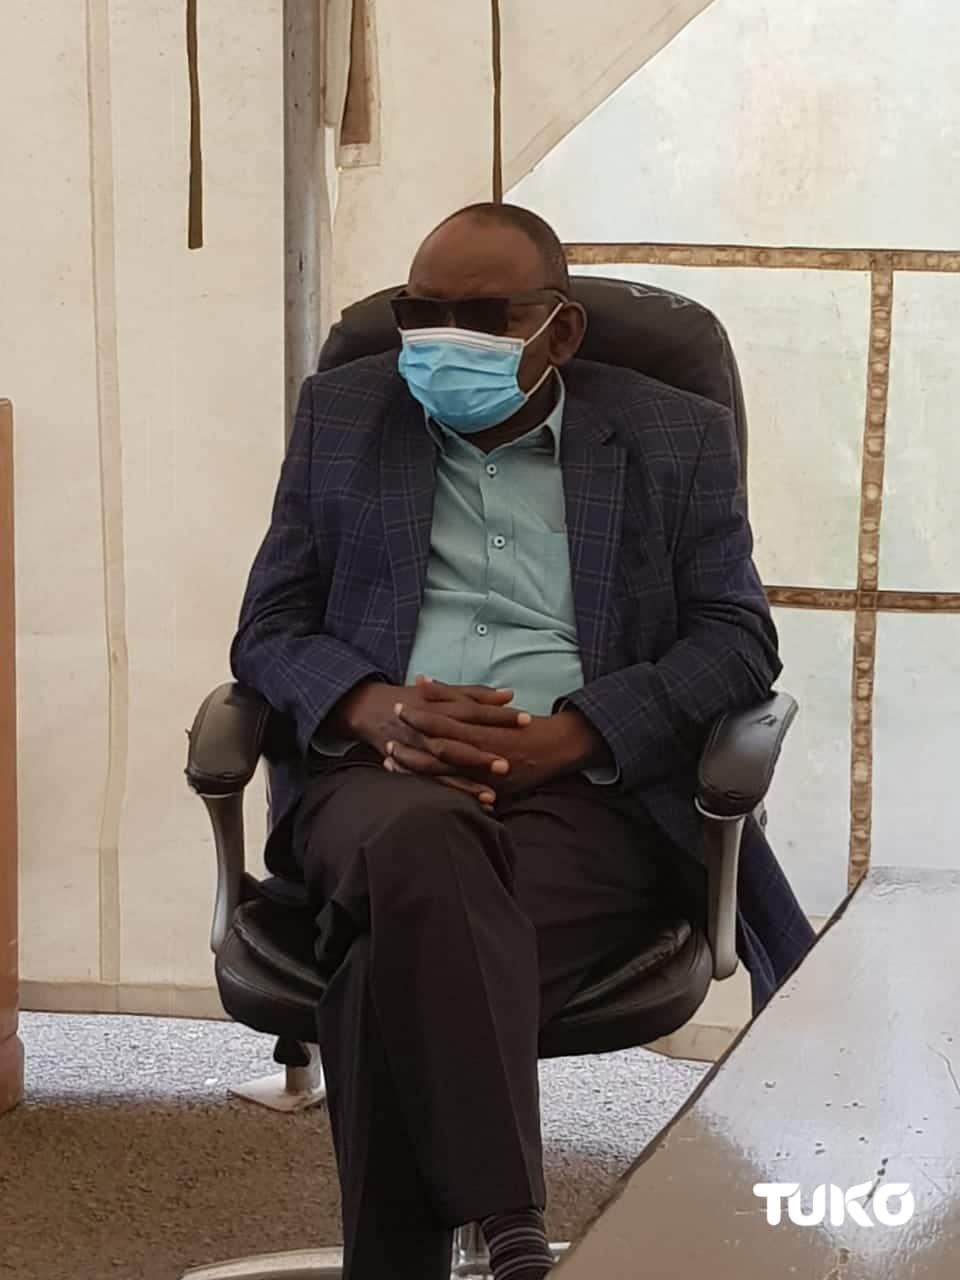 Former Kasarani MP John Njoroge sentenced to 1 year in jail for soliciting KSh 100k bribe